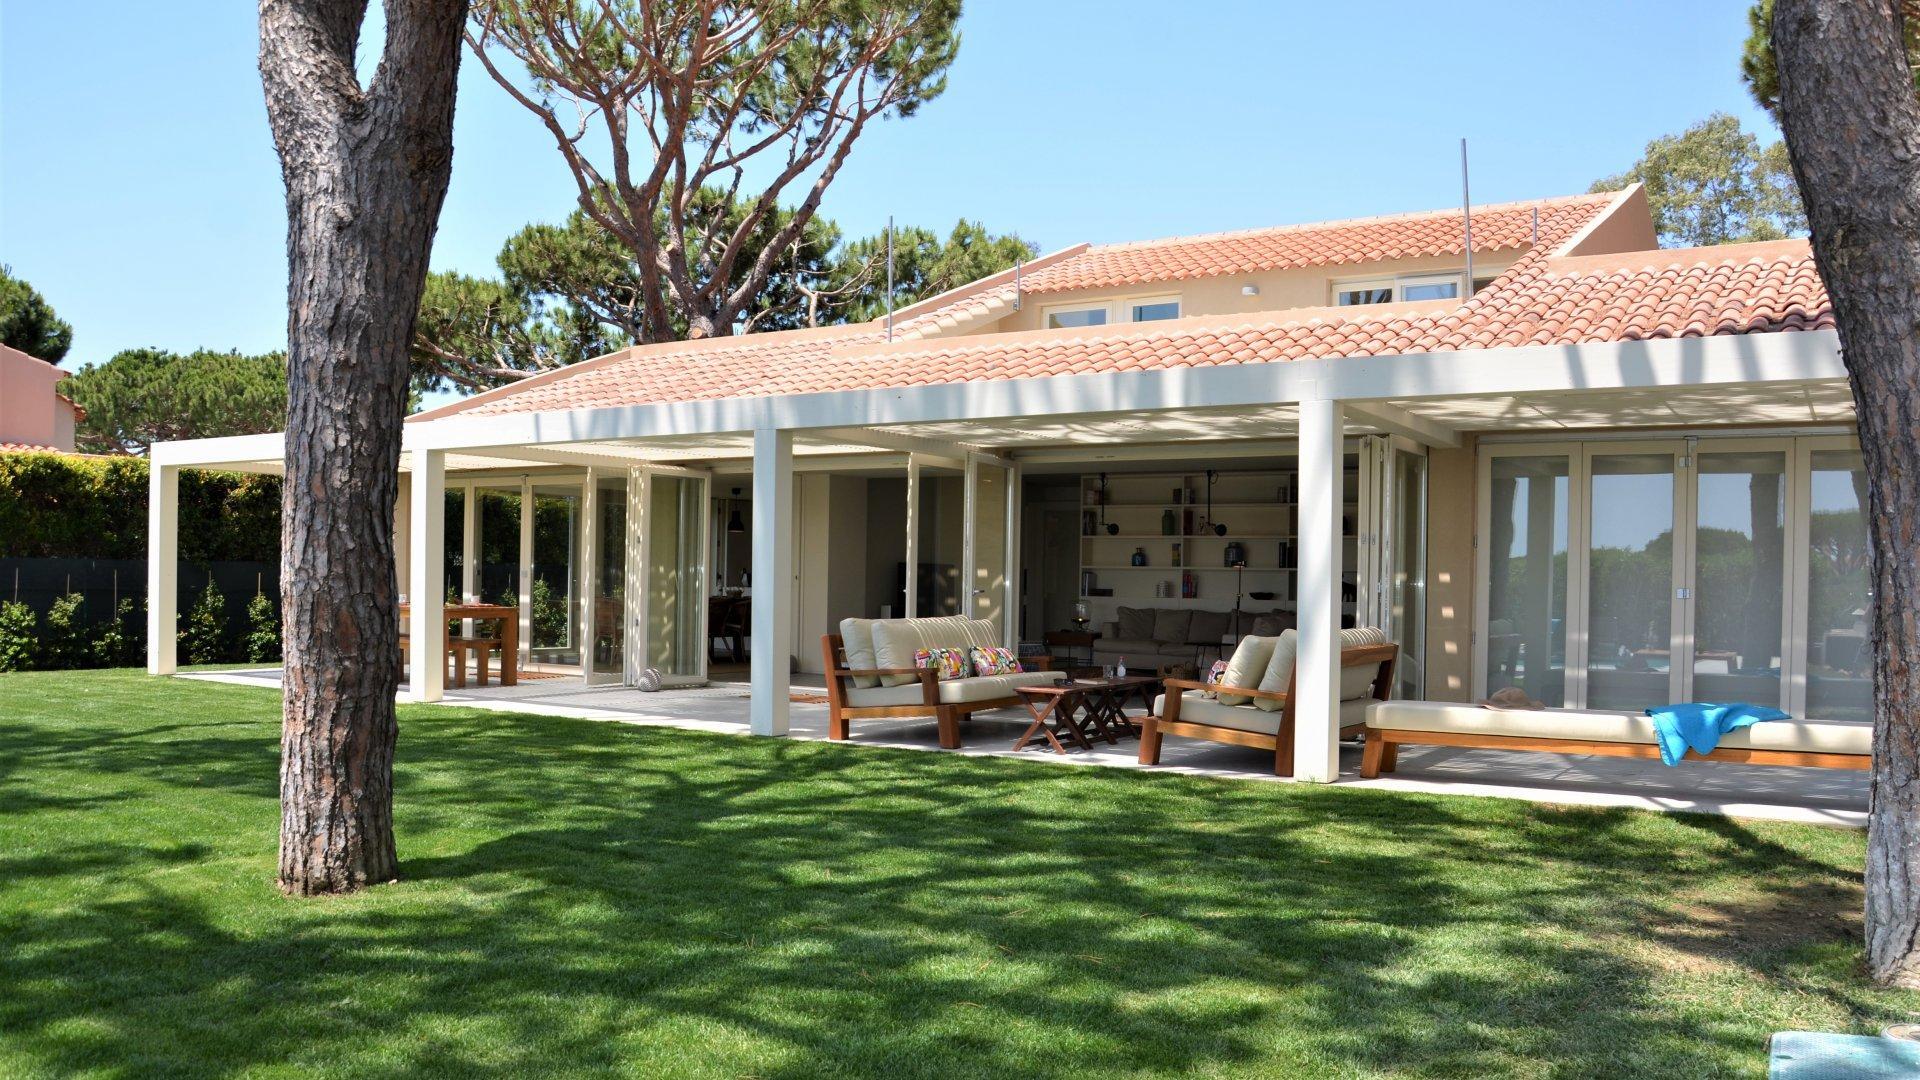 Villa Joy  - Quadradinhos, Vale do Lobo, Algarve - Villa_Joy_Vale_do_Lobo_75_1.jpg